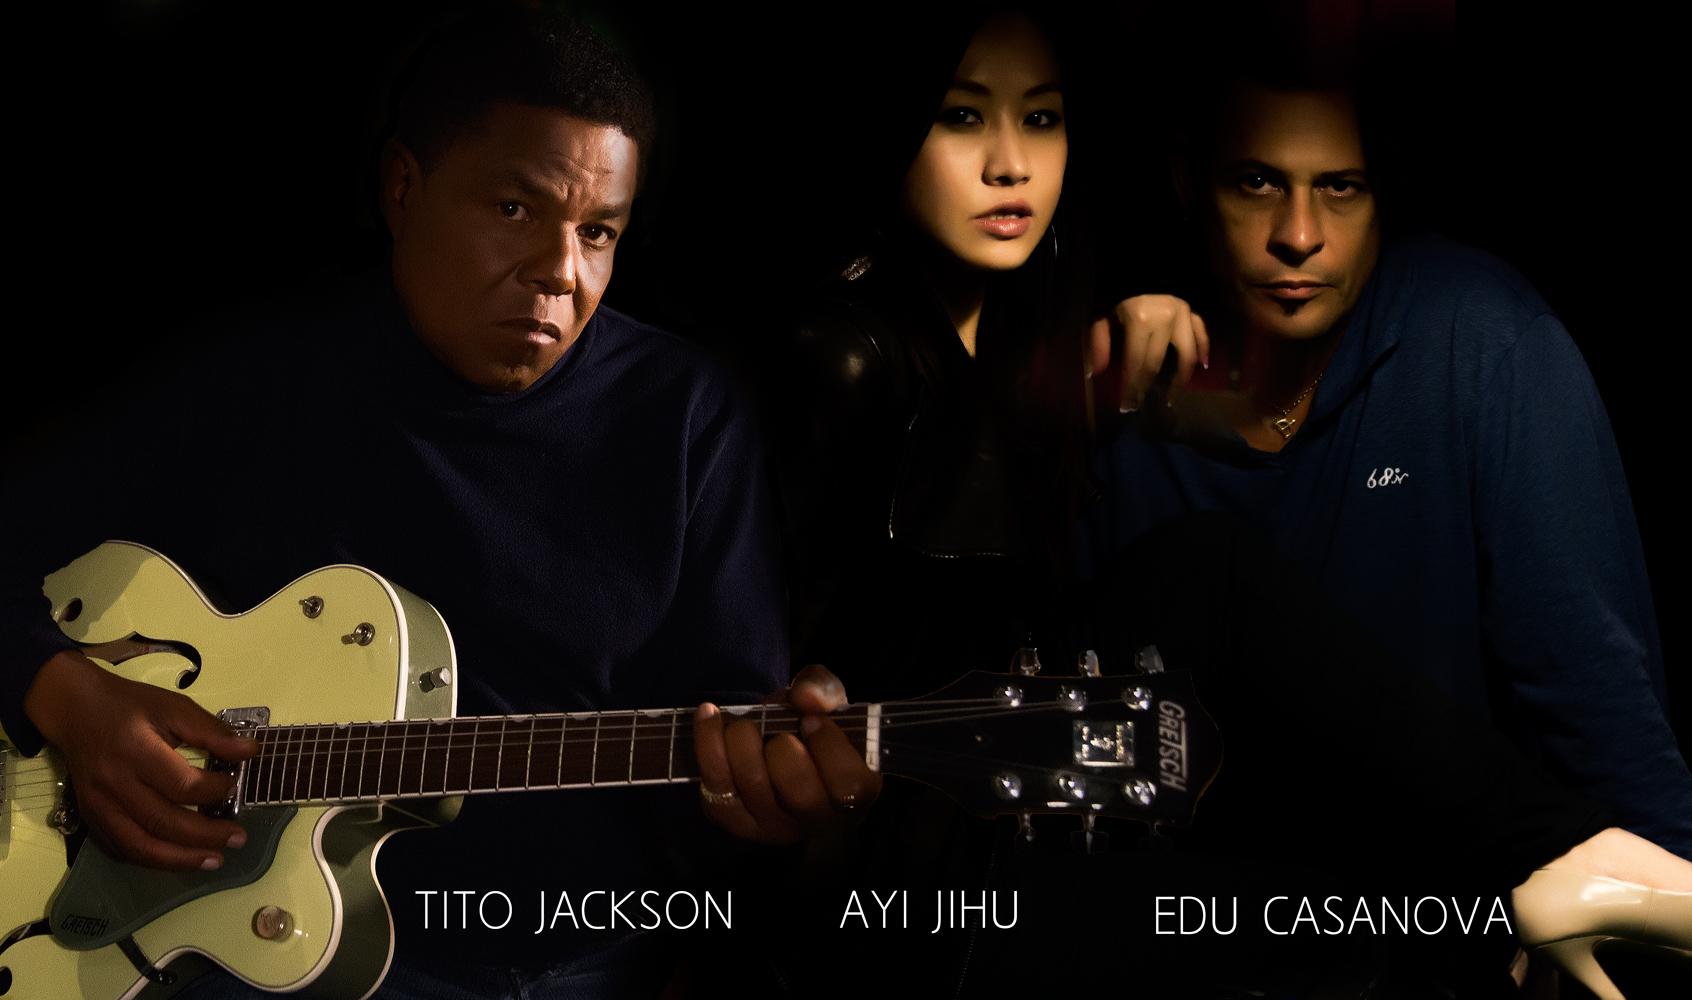 Tito Jackson, Ayi Jihu and Edu Casanova collaborate on new song Bola Vez